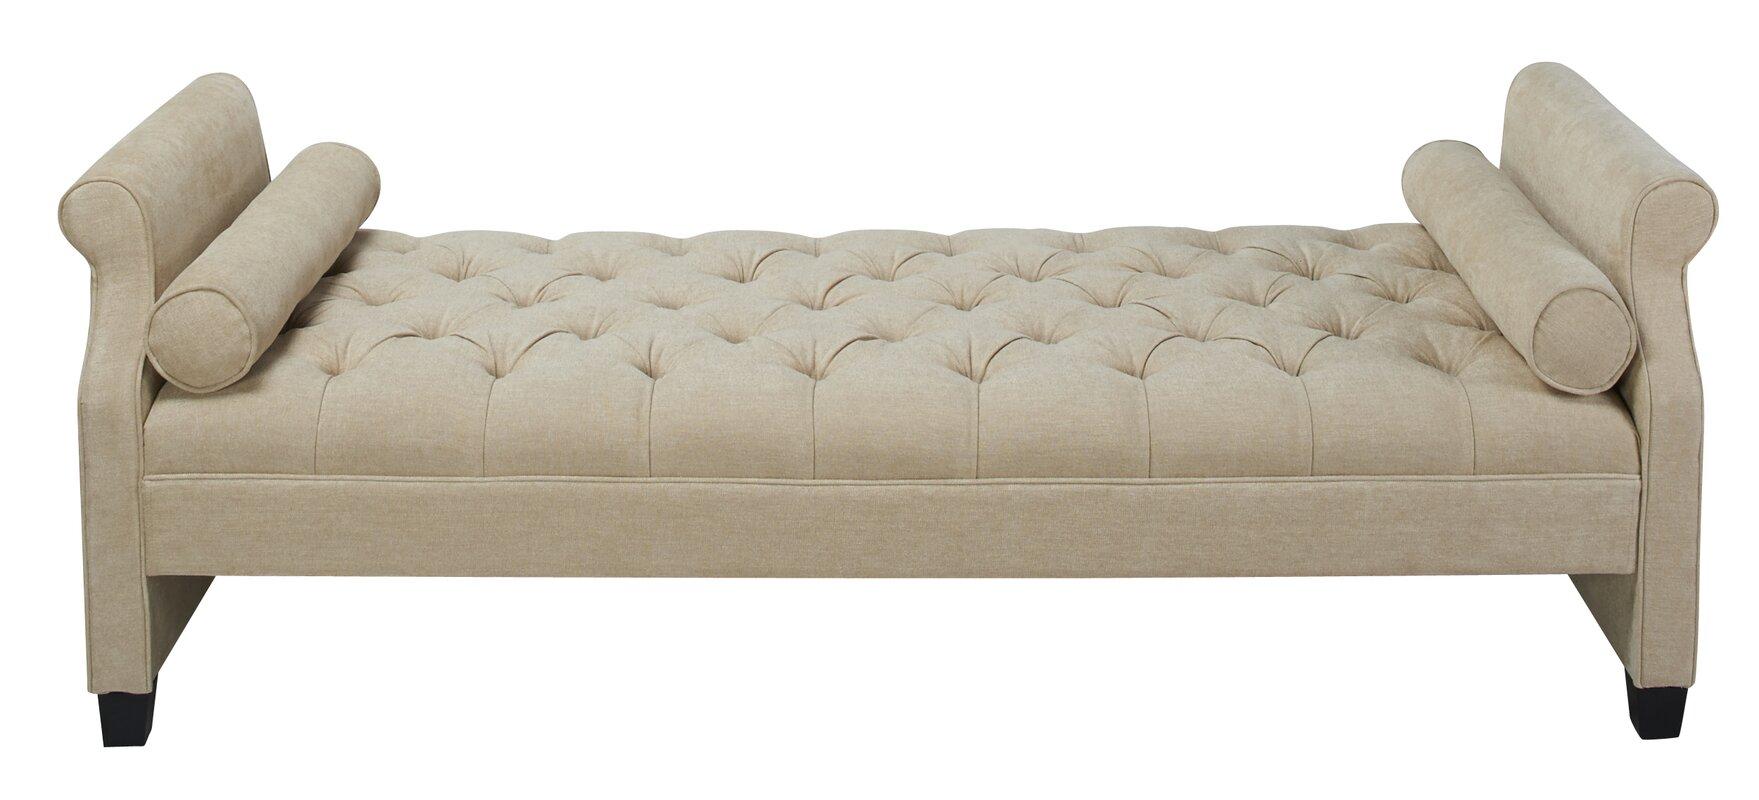 Design Bedroom Bench httpssecure img1 fg wfcdn comim67604828resiz